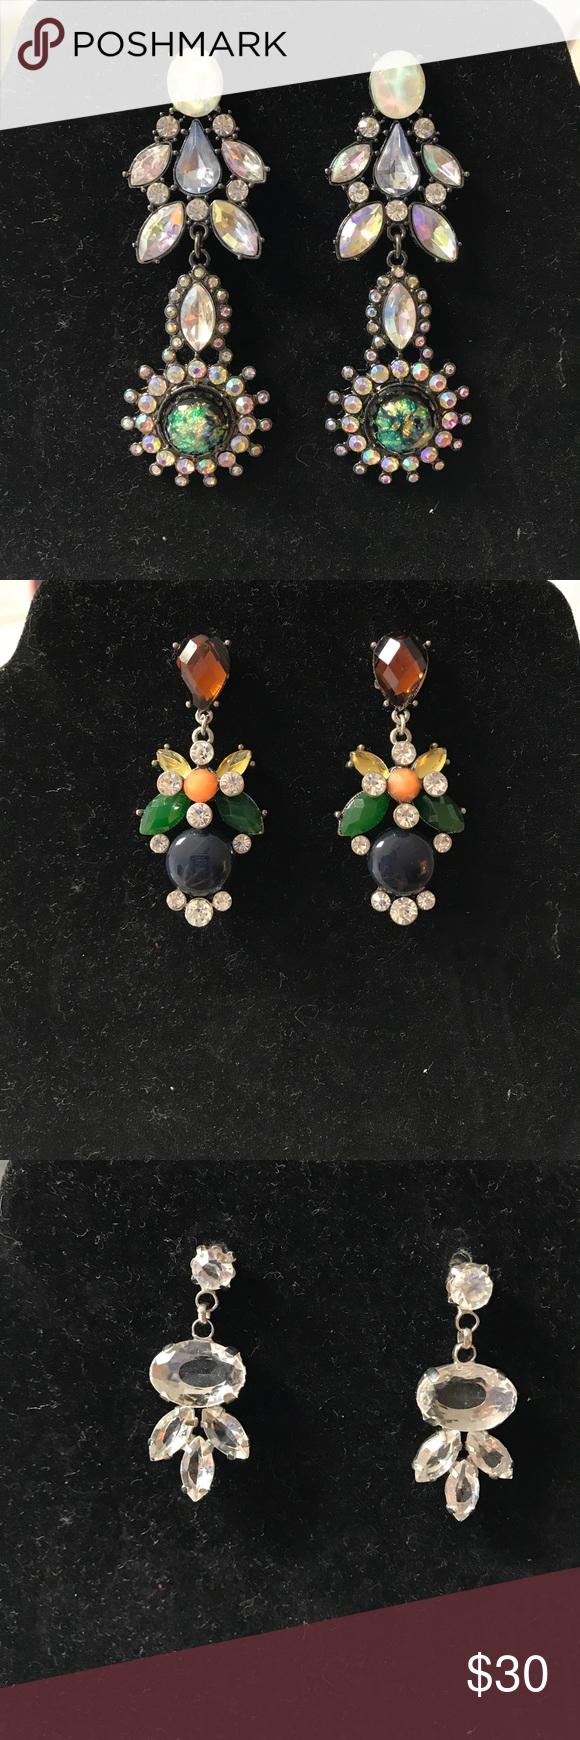 3pair of chandeliers earrings nwot chandelier earrings nordstrom 3pair of chandeliers earrings nwot arubaitofo Choice Image